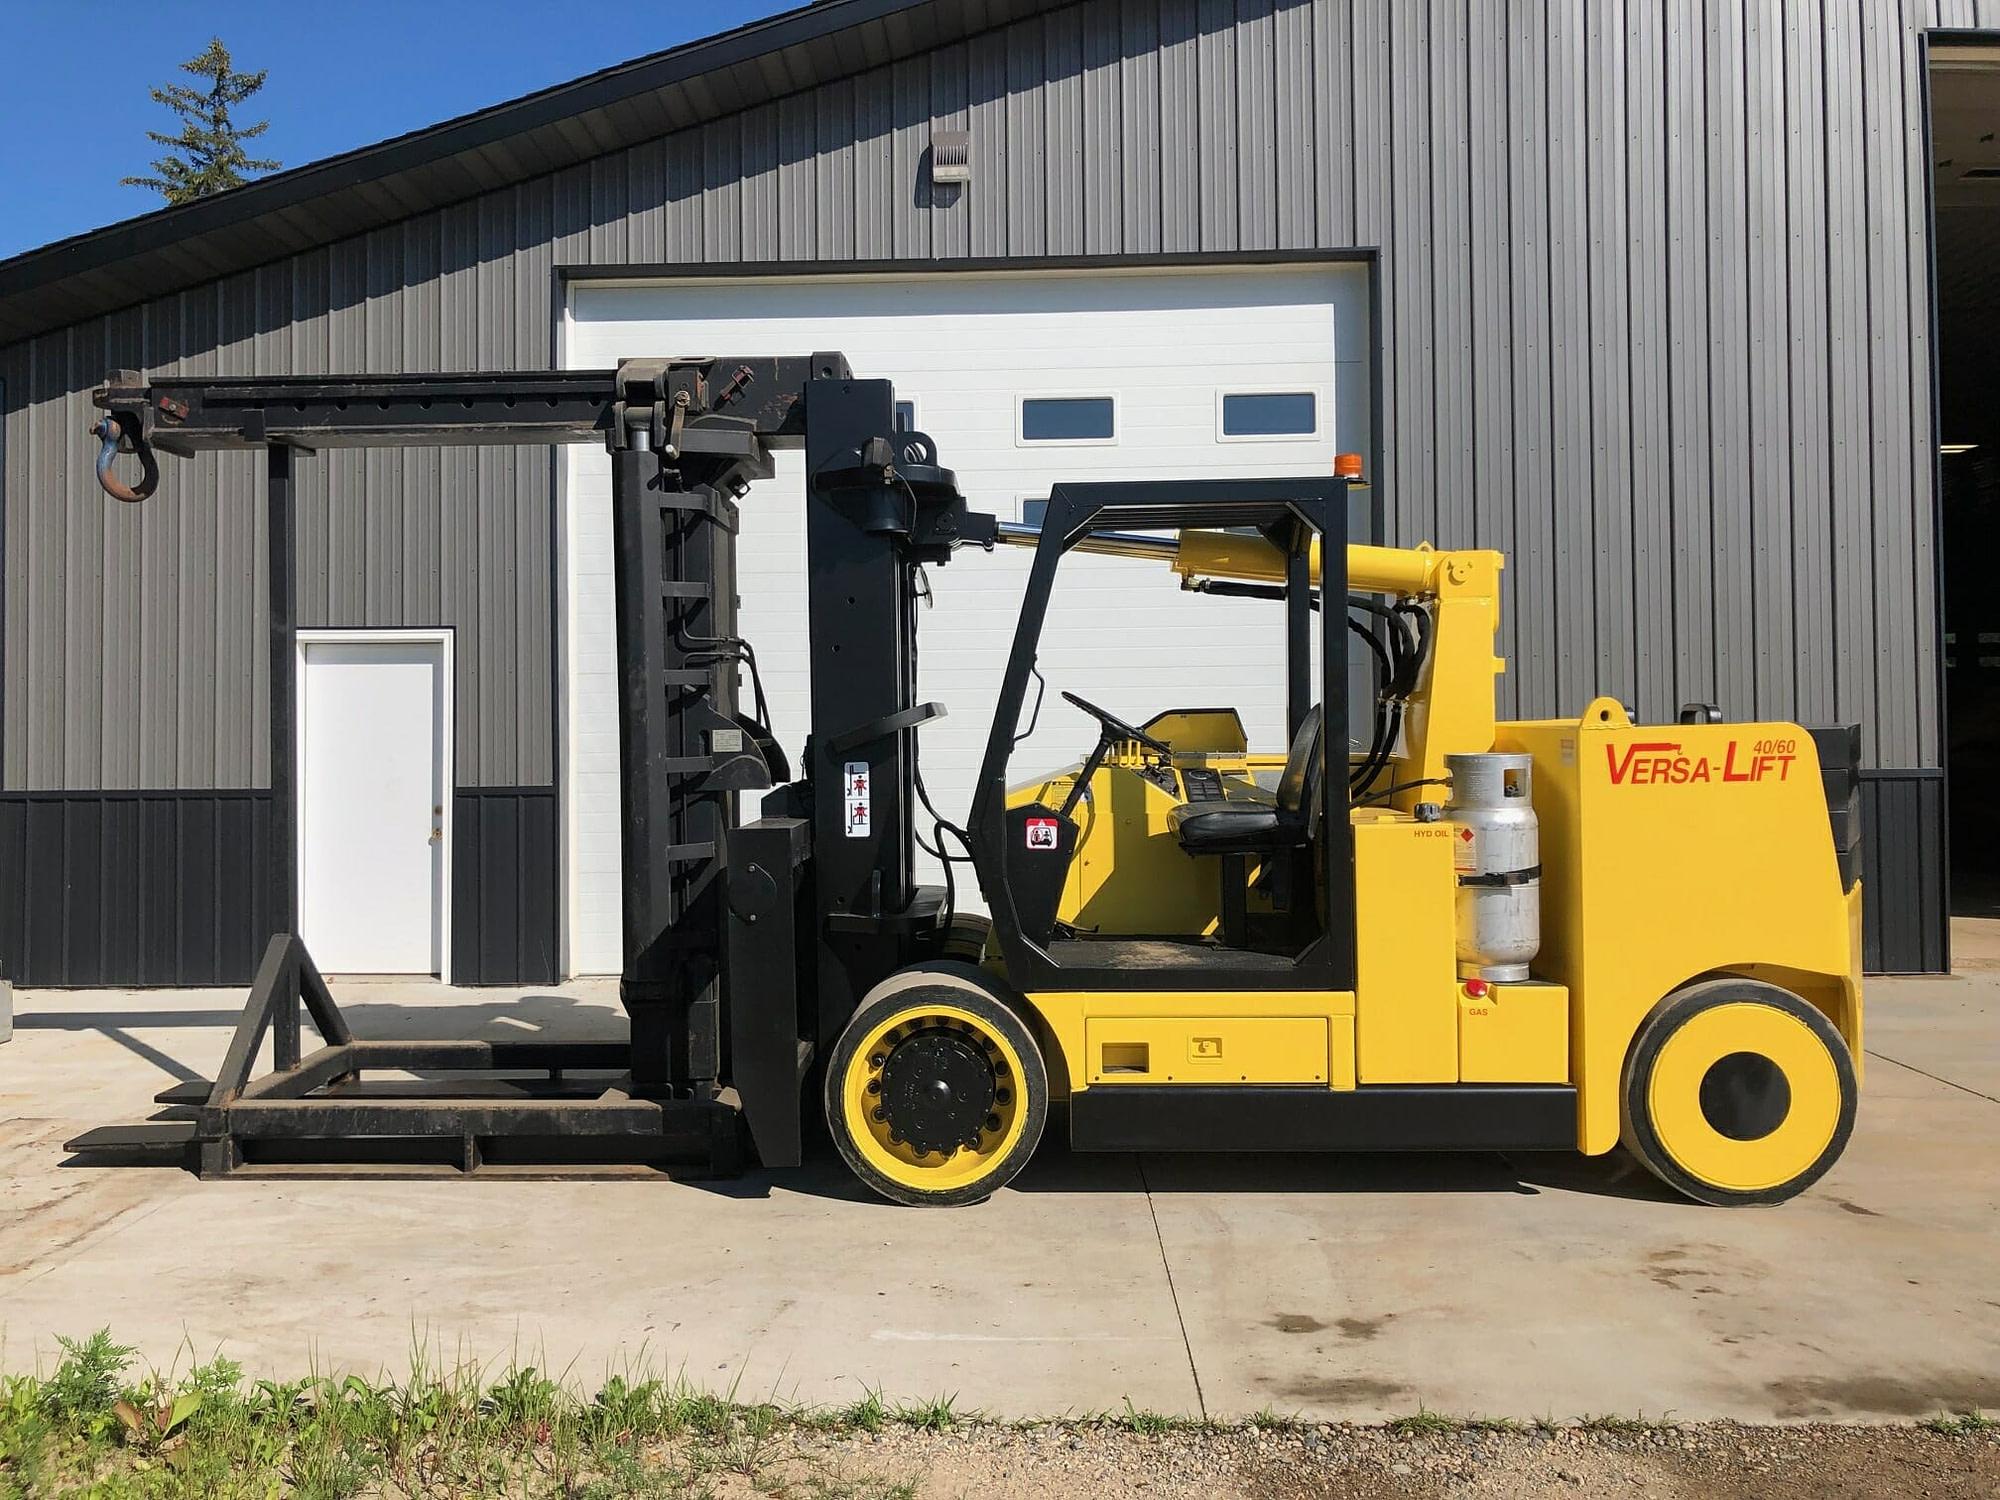 Versa-Lift Forklift For Sale